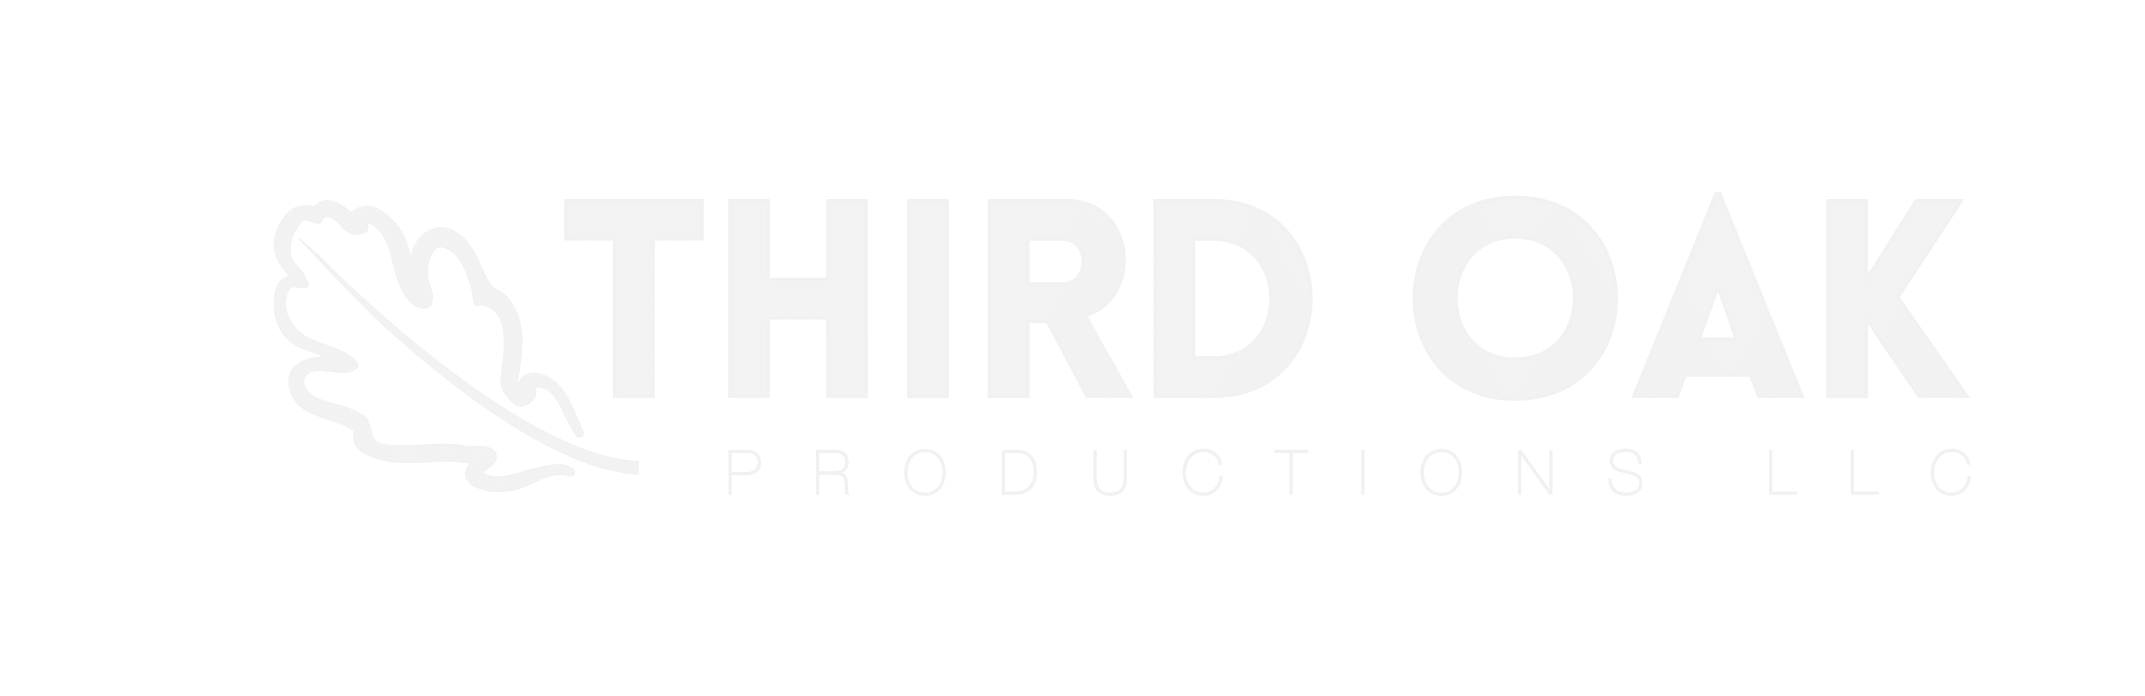 Third Oak Productions LLC | Orlando, Florida